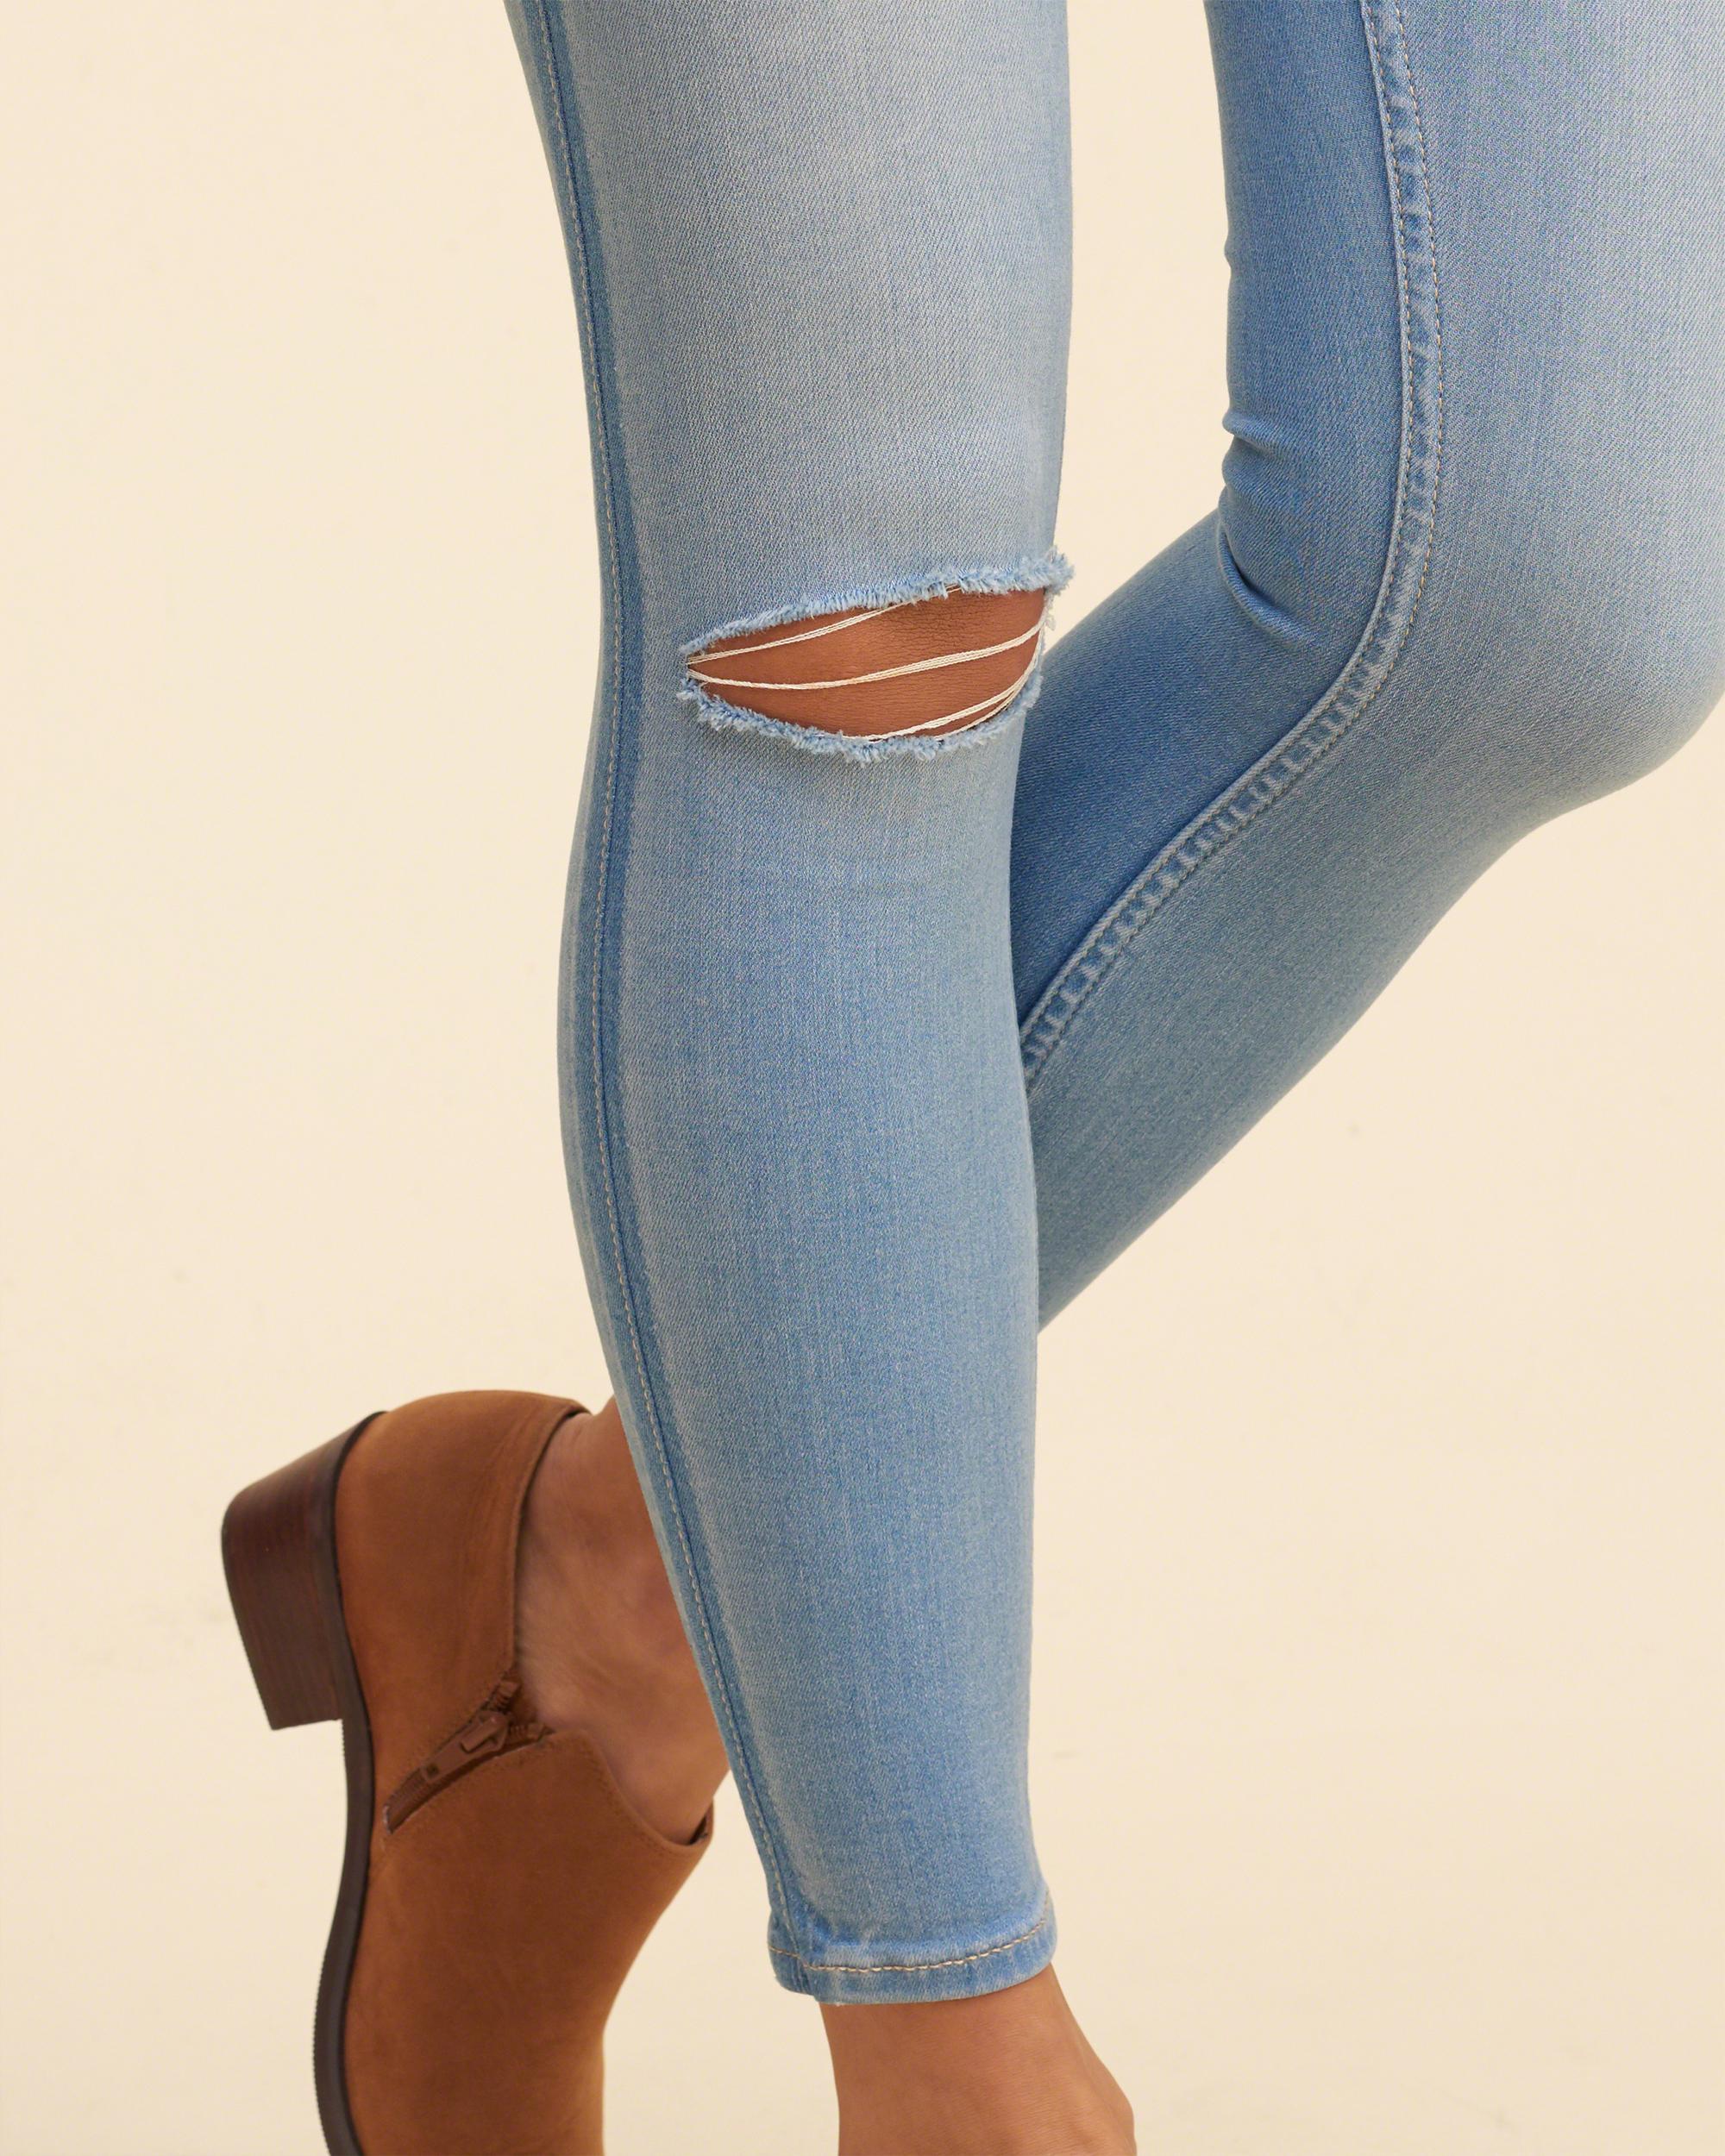 Hollister Denim Low-rise Crop Jean Leggings in Blue